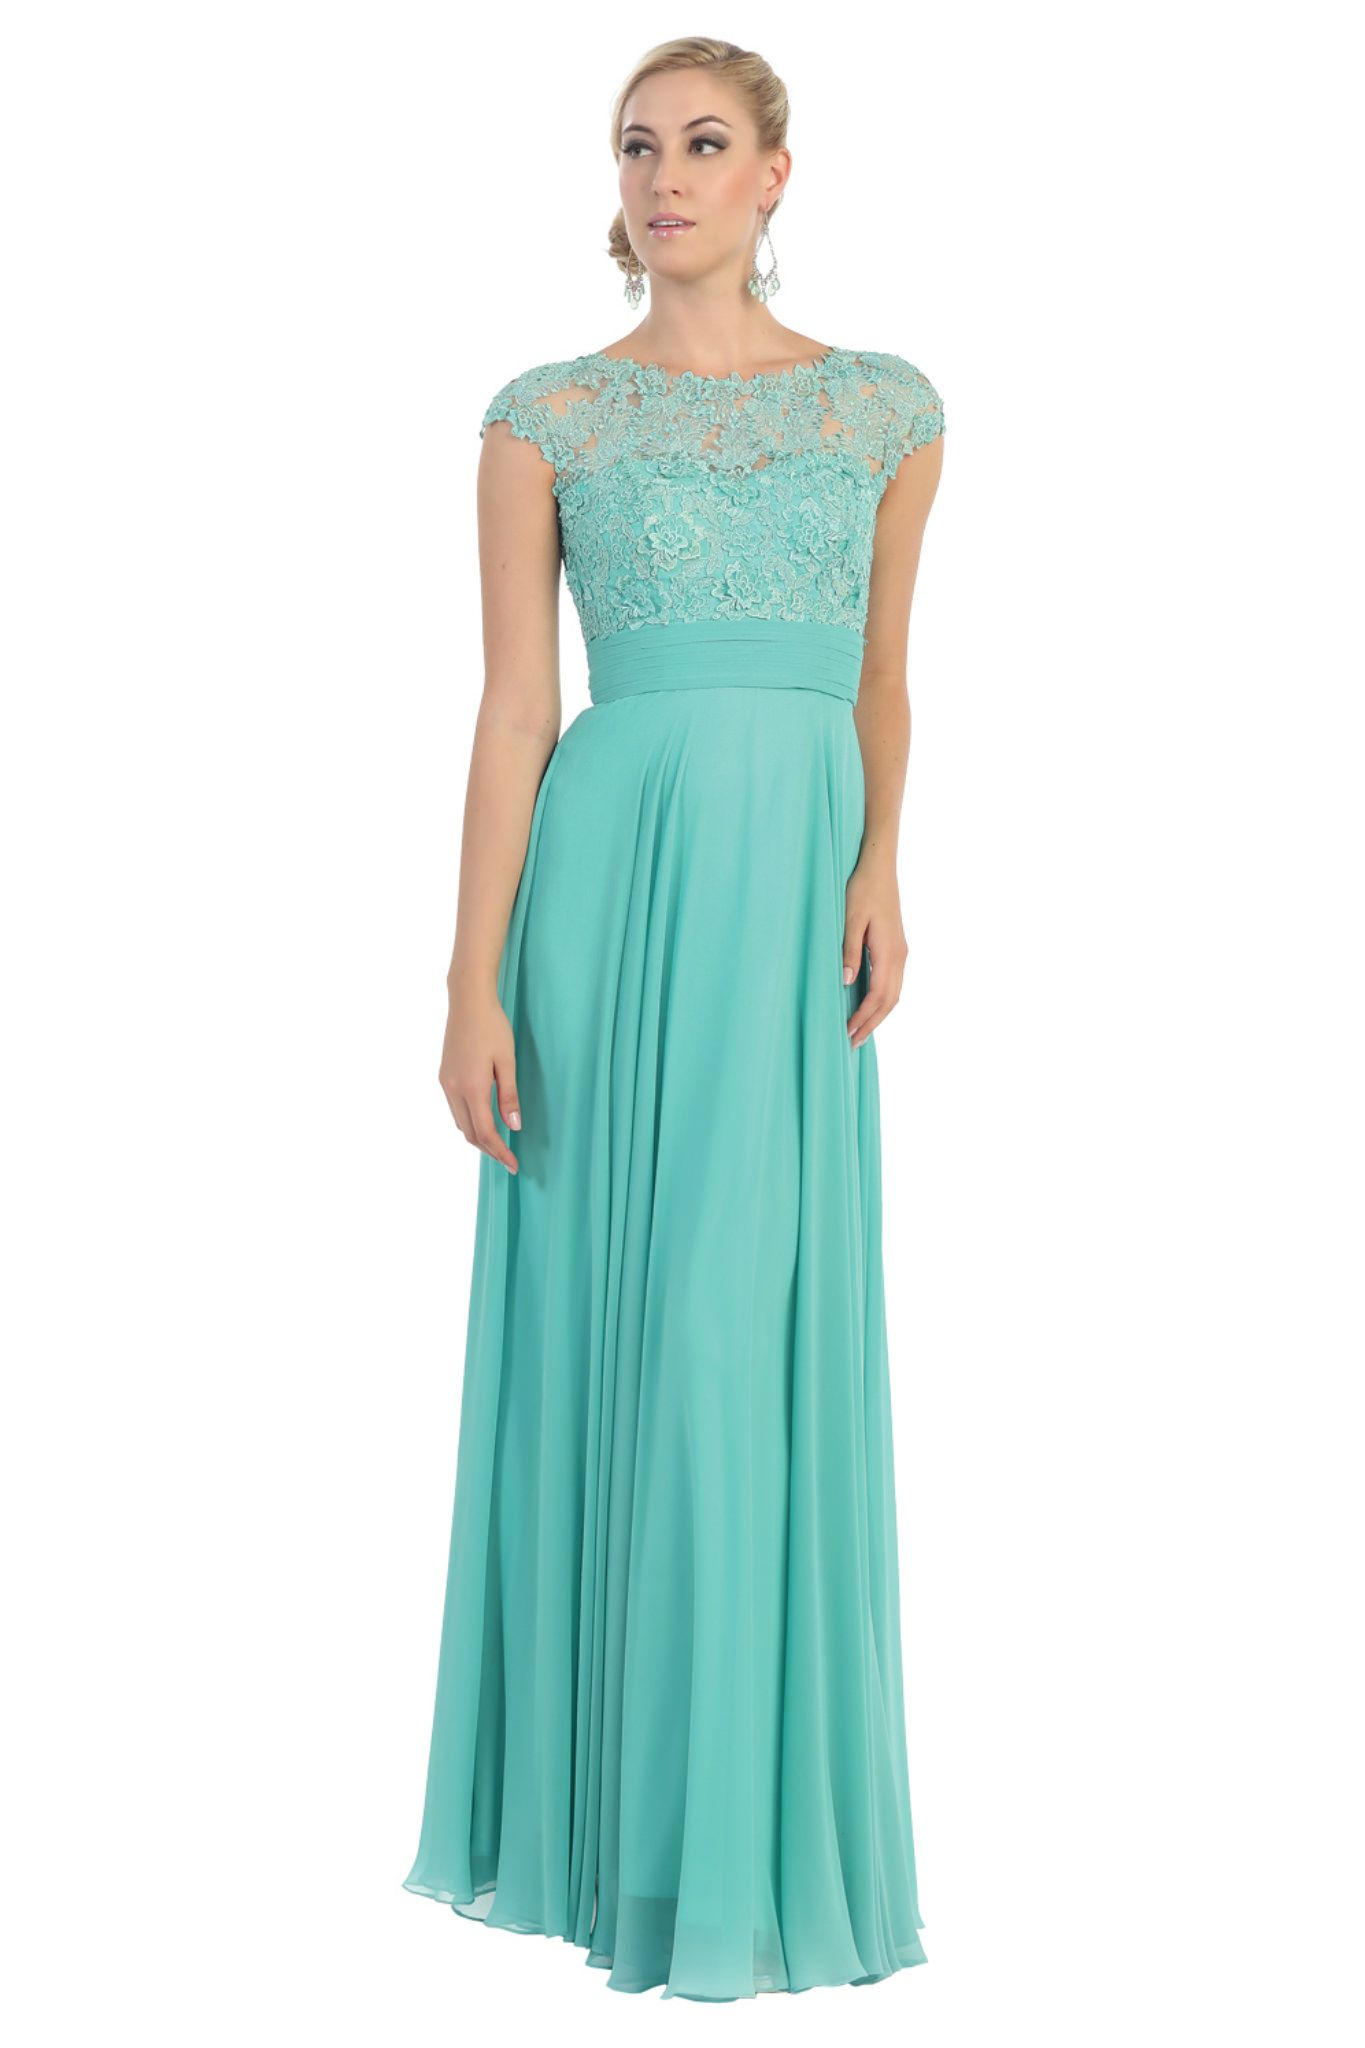 Elegant Modest Wedding Formal Gown Short Sleeve Lace Applique ...